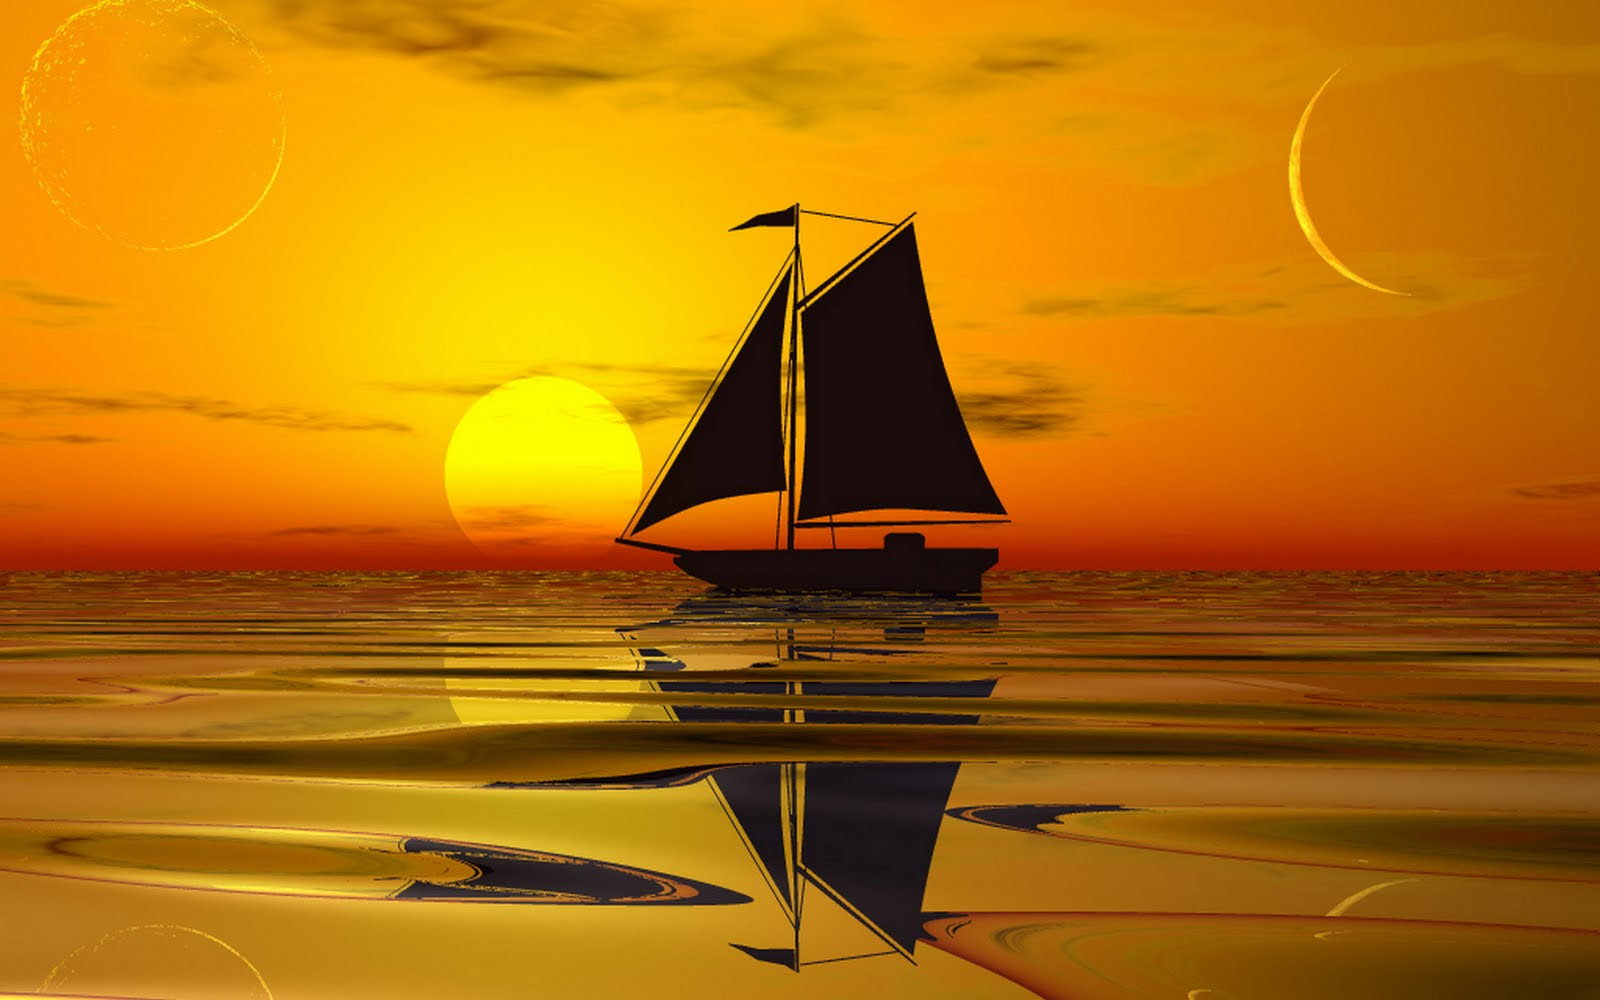 http://1.bp.blogspot.com/-Kiyexd19Pjo/TkAuyFL1tuI/AAAAAAAAKaw/Vy_2En1bN2I/s1600/Sailing+vessels+%252839%2529.jpg